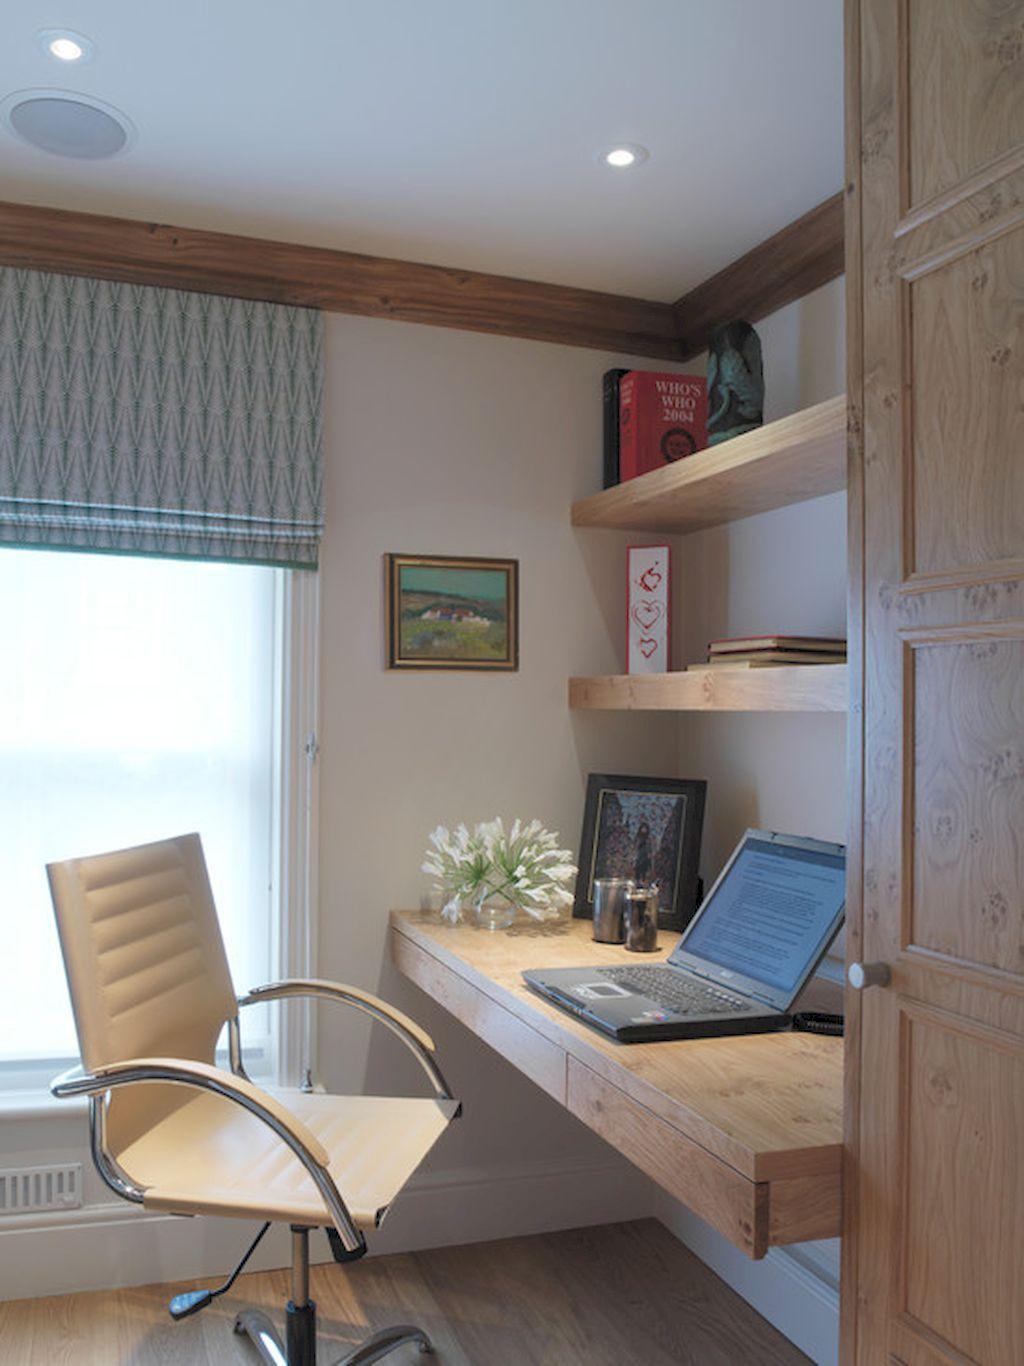 70 Simple Home Office Decor Ideas For Men   Roomaniac.com